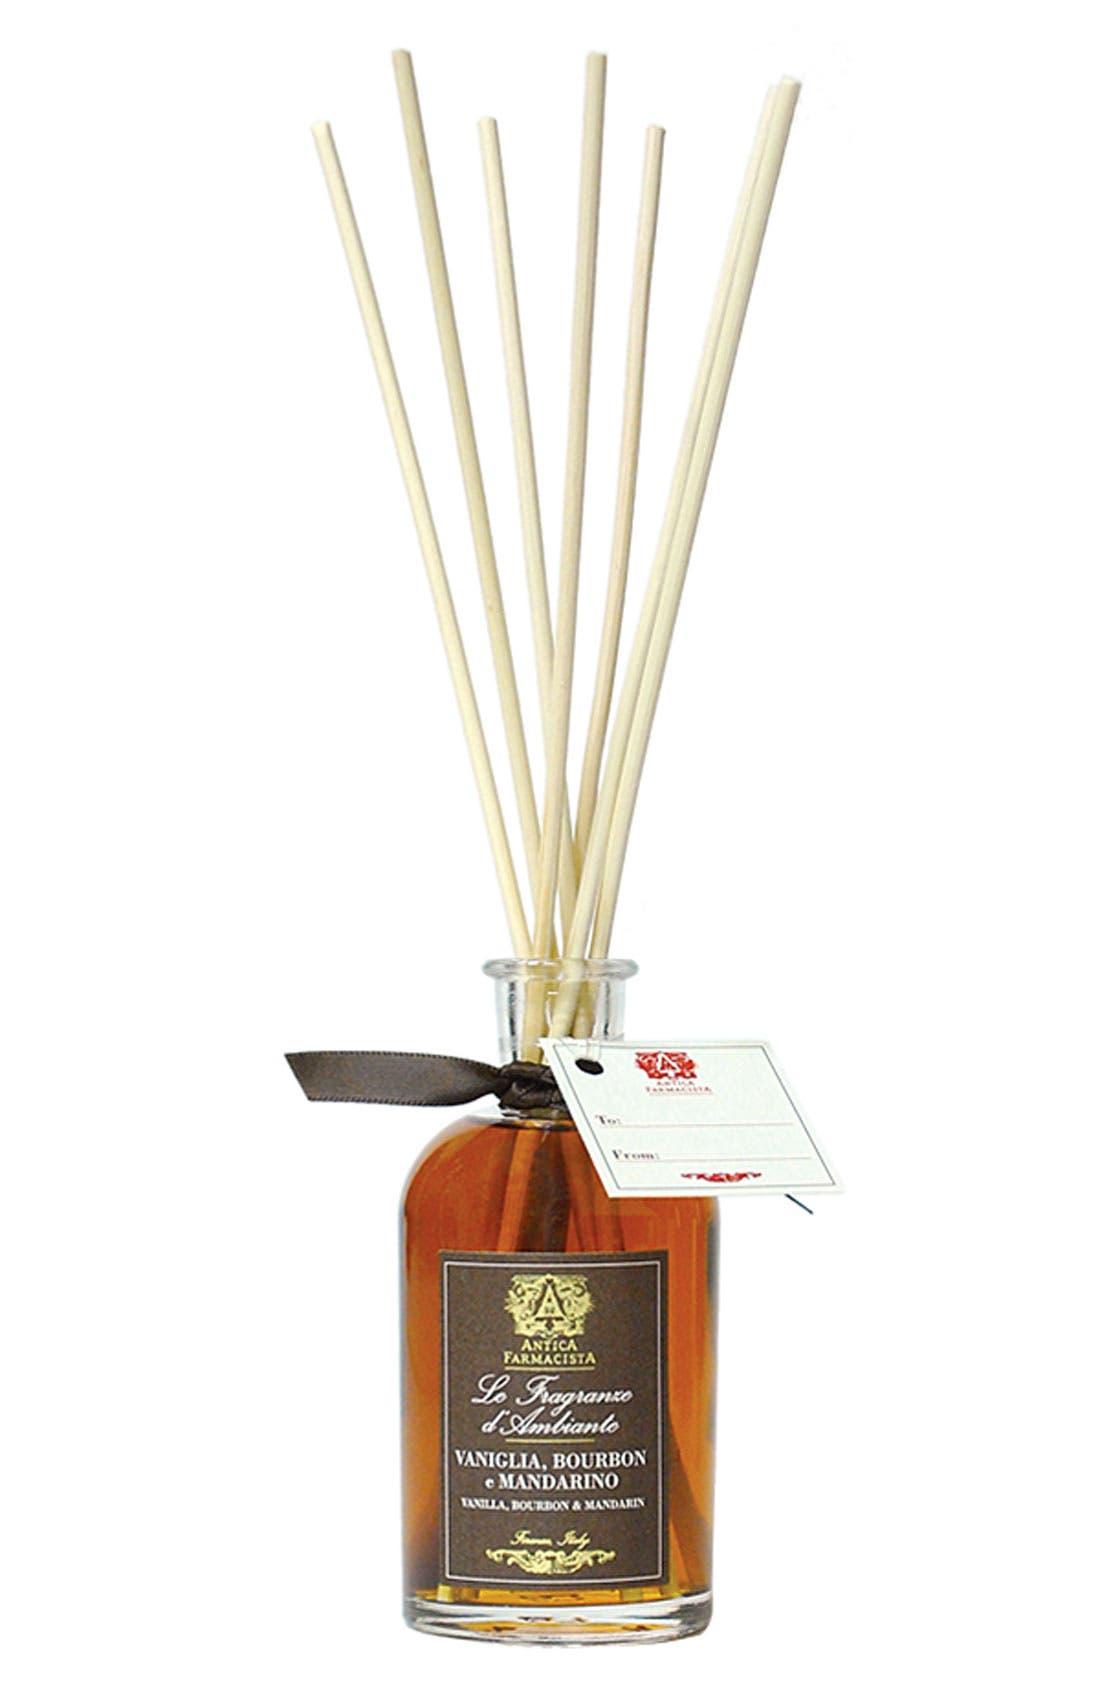 Antica Farmacista 'Vanilla, Bourbon & Mandarin' Home Ambiance Perfume (3.3 oz.)